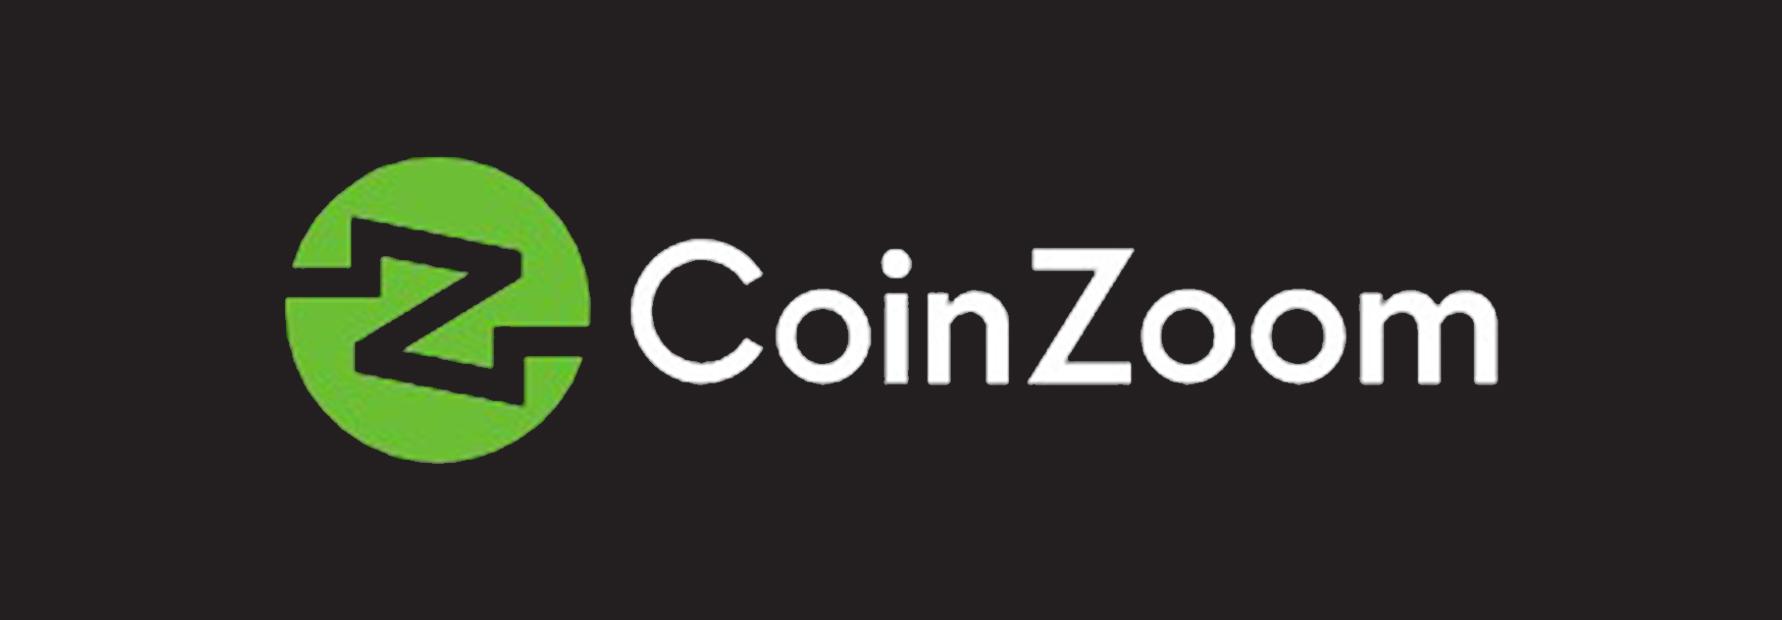 CoinZoom